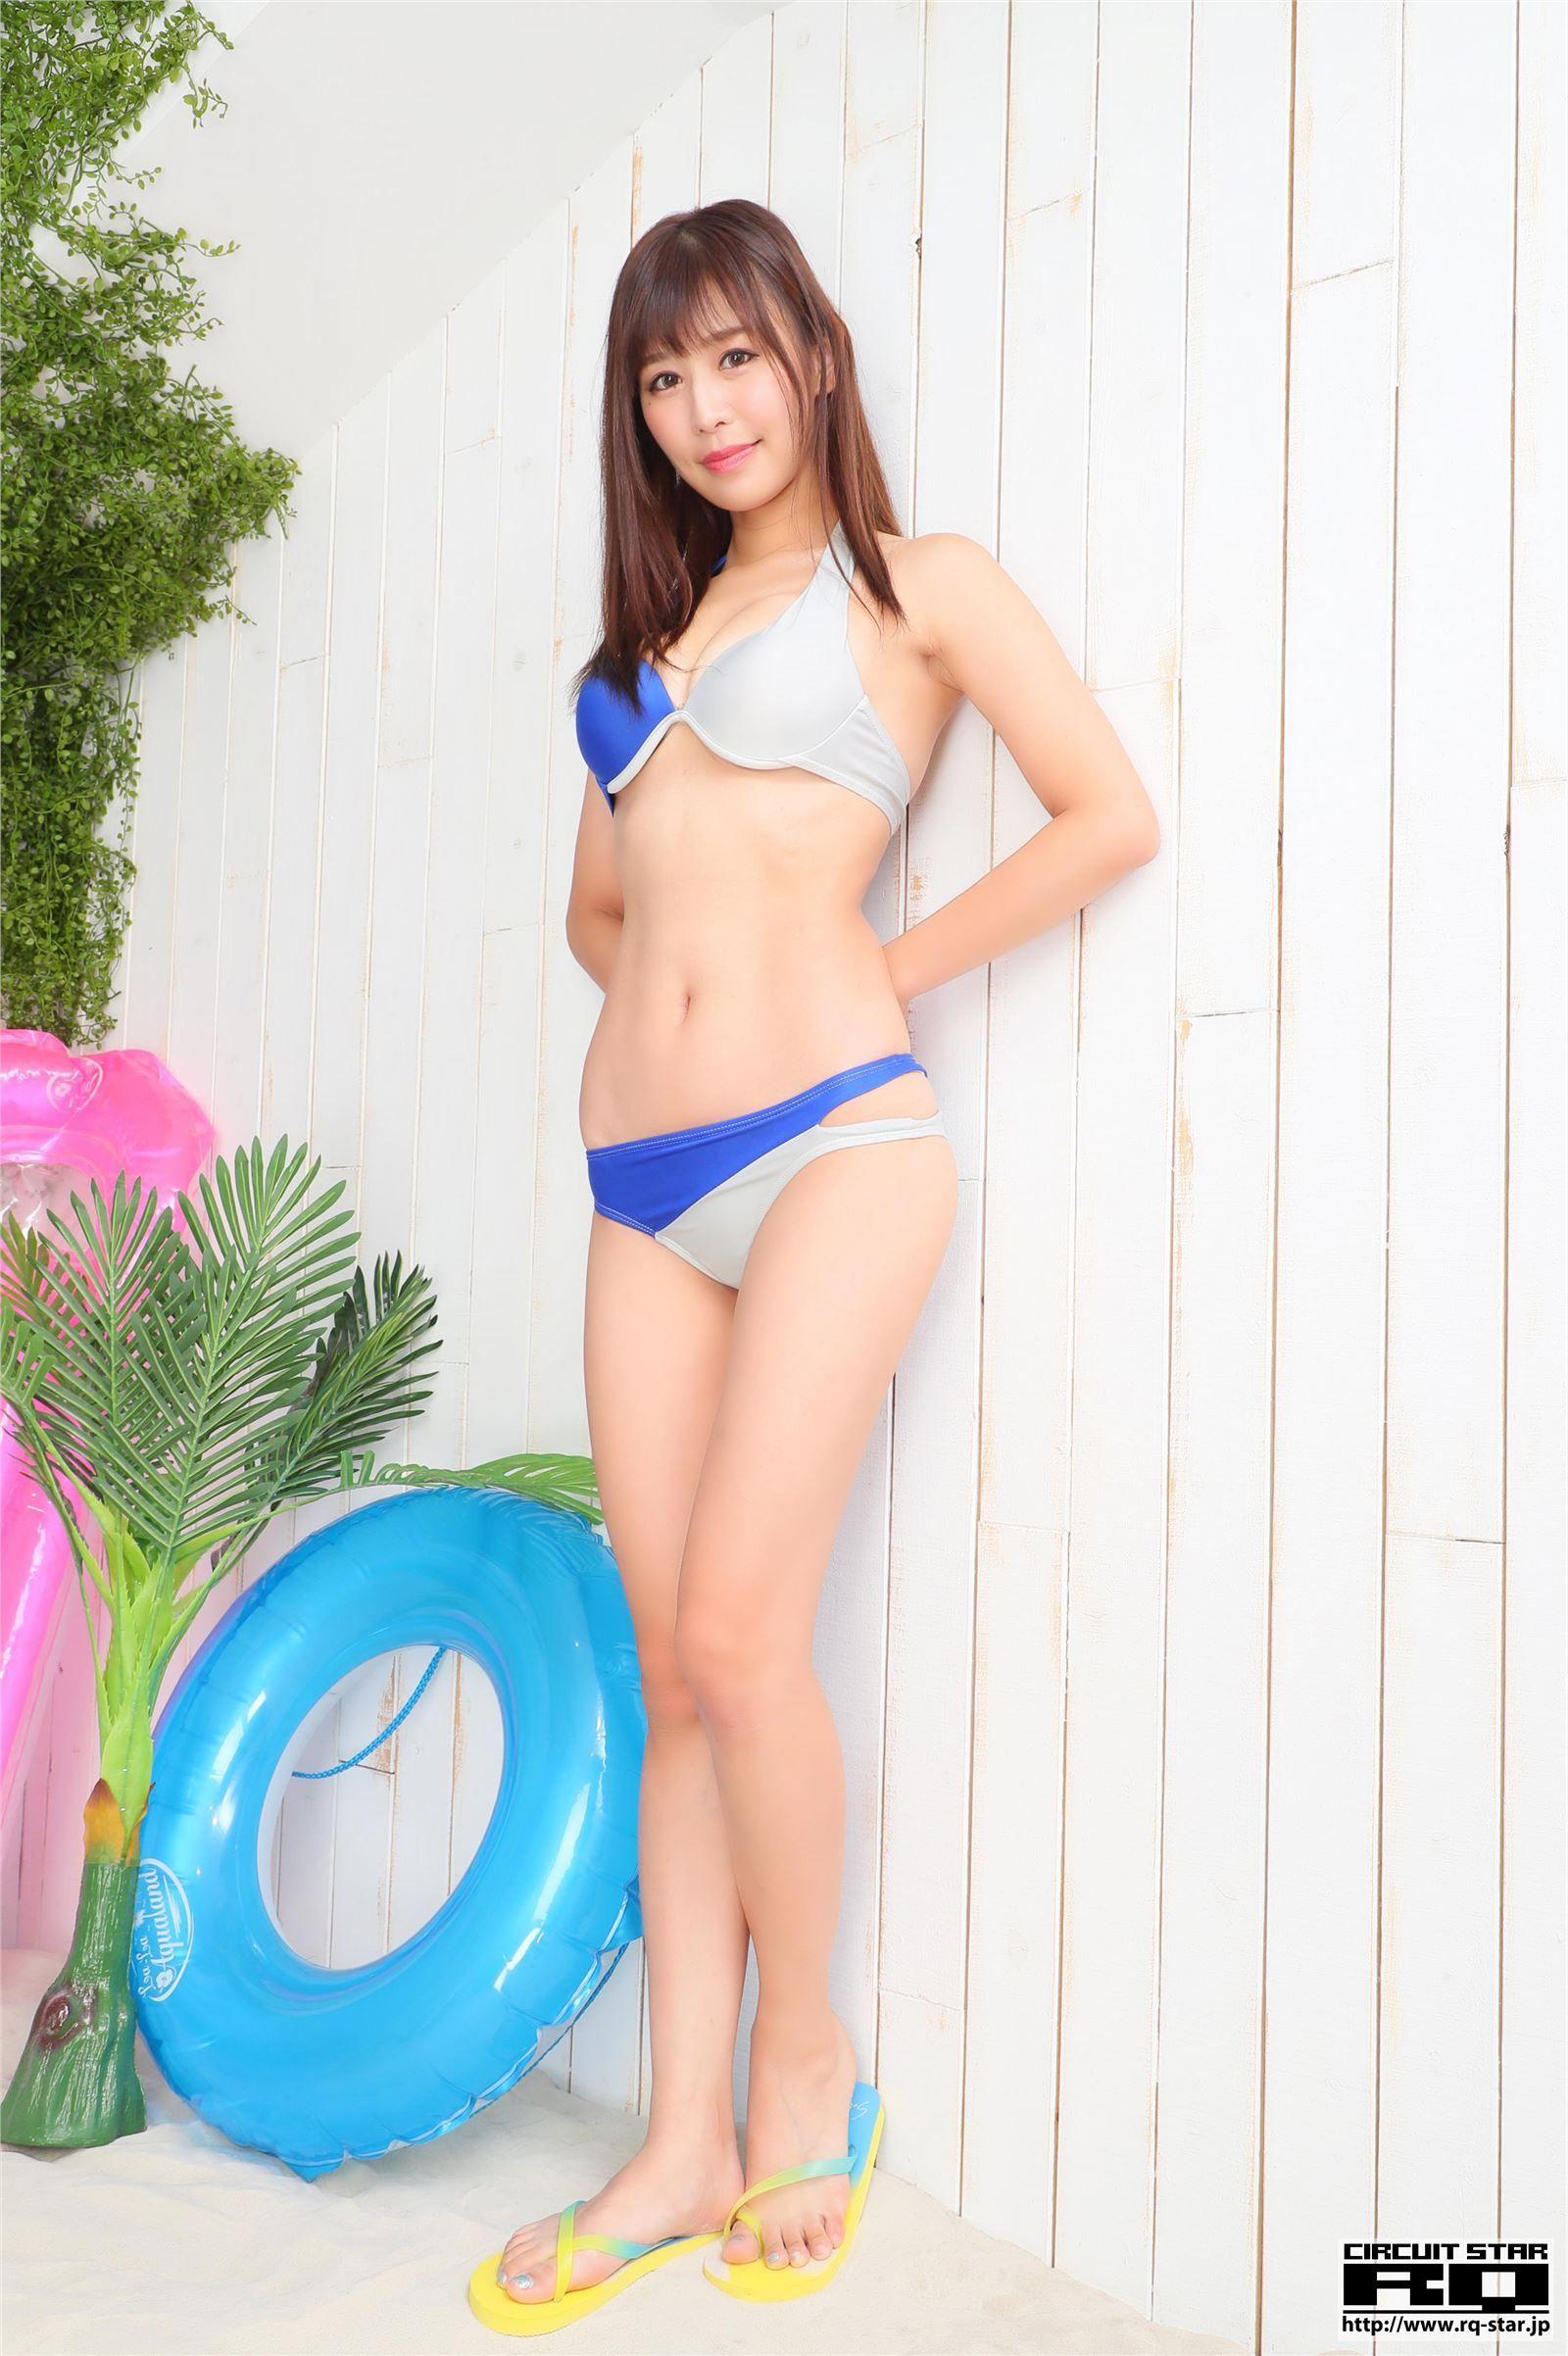 [RQ STAR美女] 2018.08.04 Aya Miyazaki 宮崎彩 Swim Suits[80P] RQ STAR 第1张